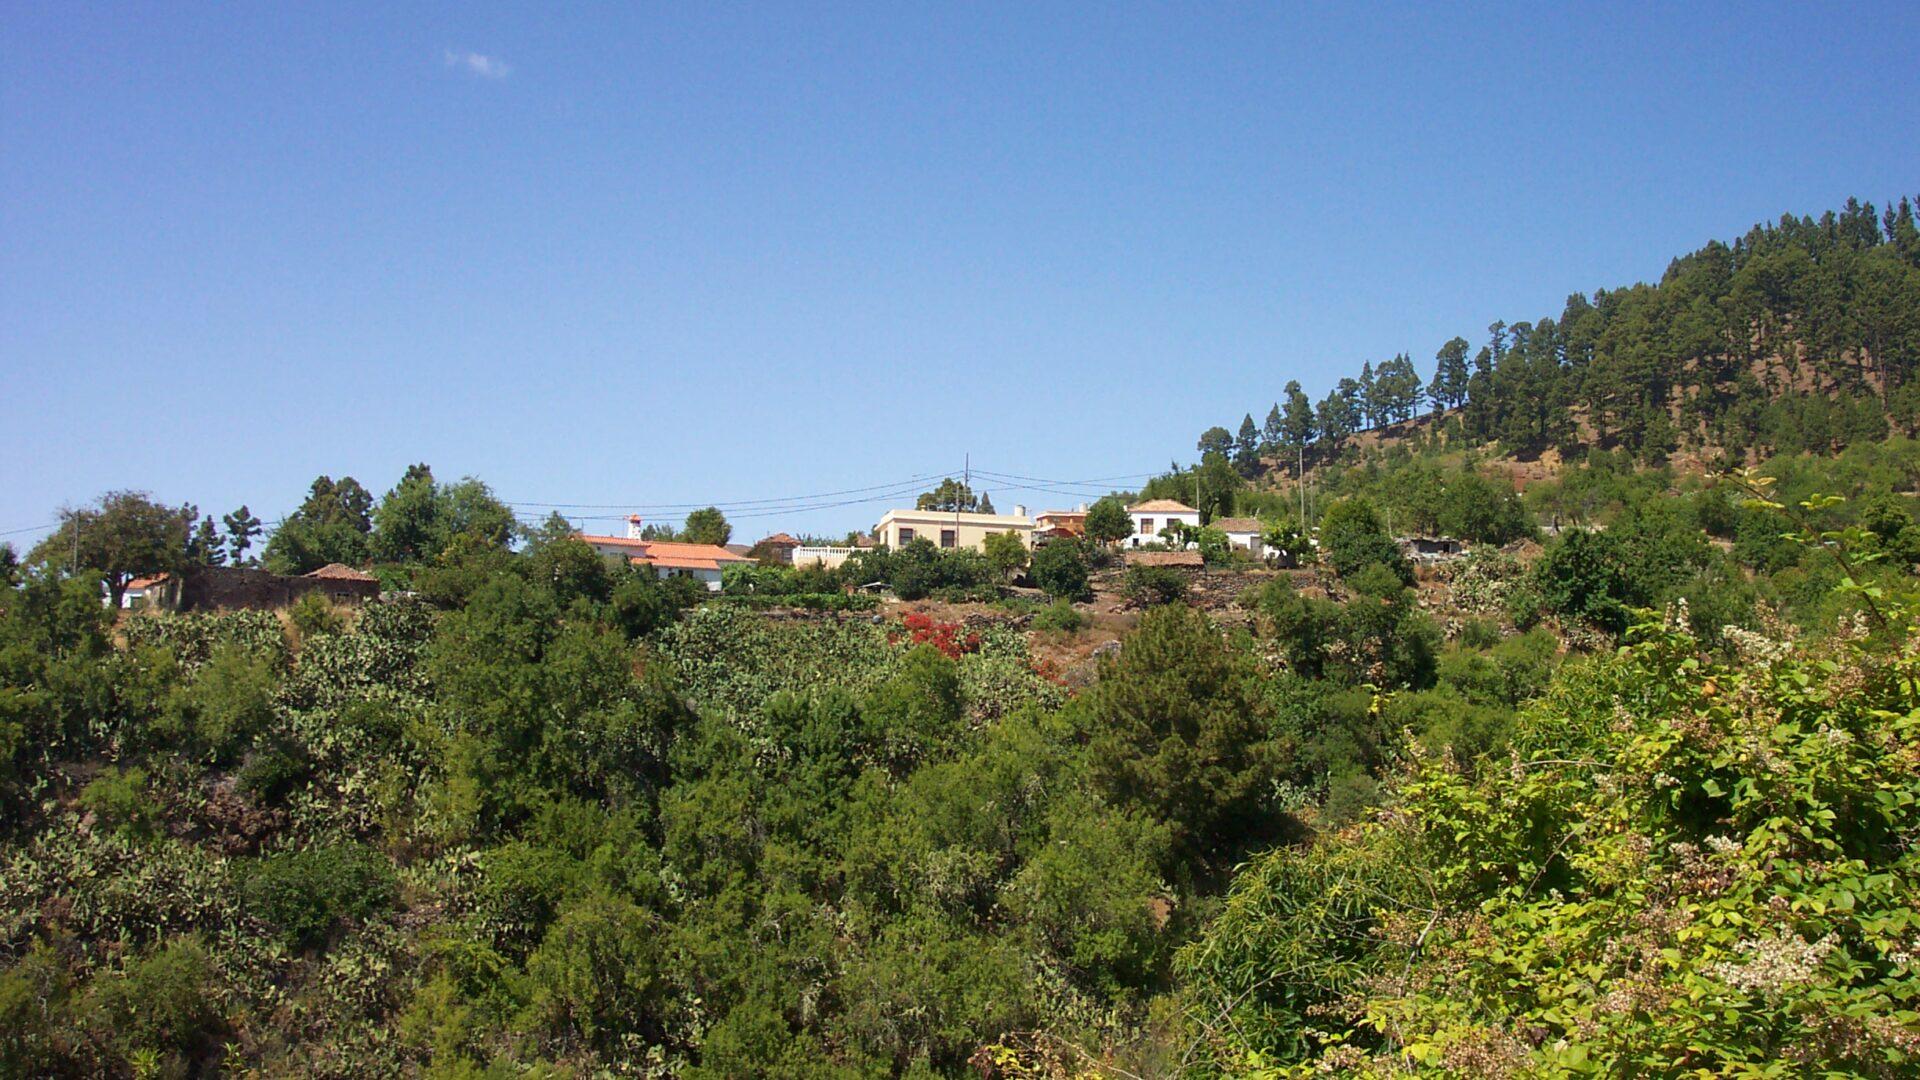 Exc. La Palma Spezial Viajes Pamir (6) Der Nordosten